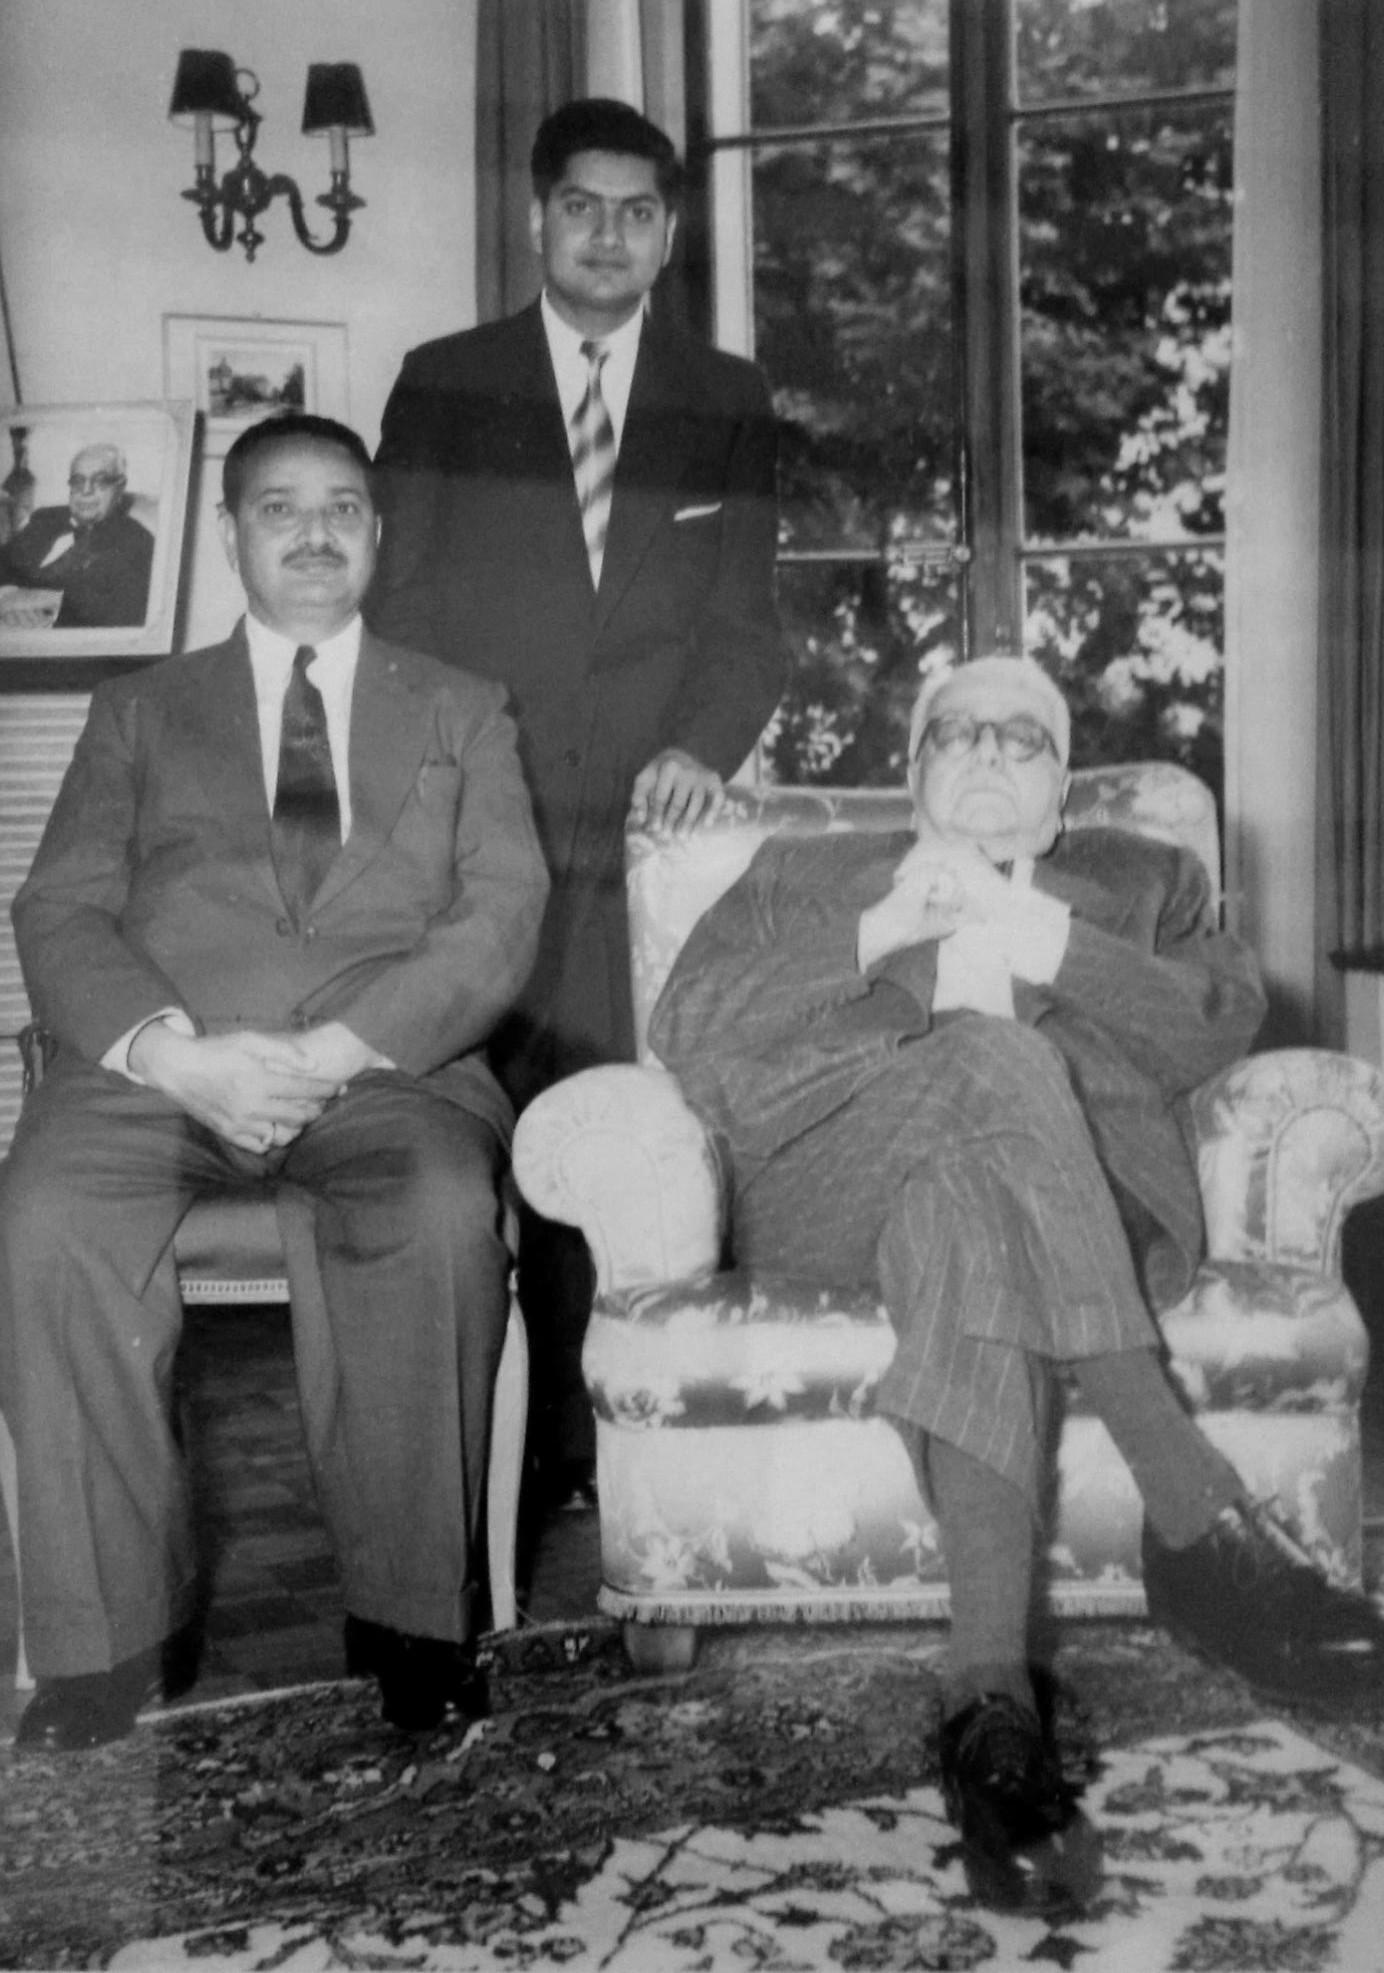 Merali Hirji and his son Mahdi with Aga Khan III